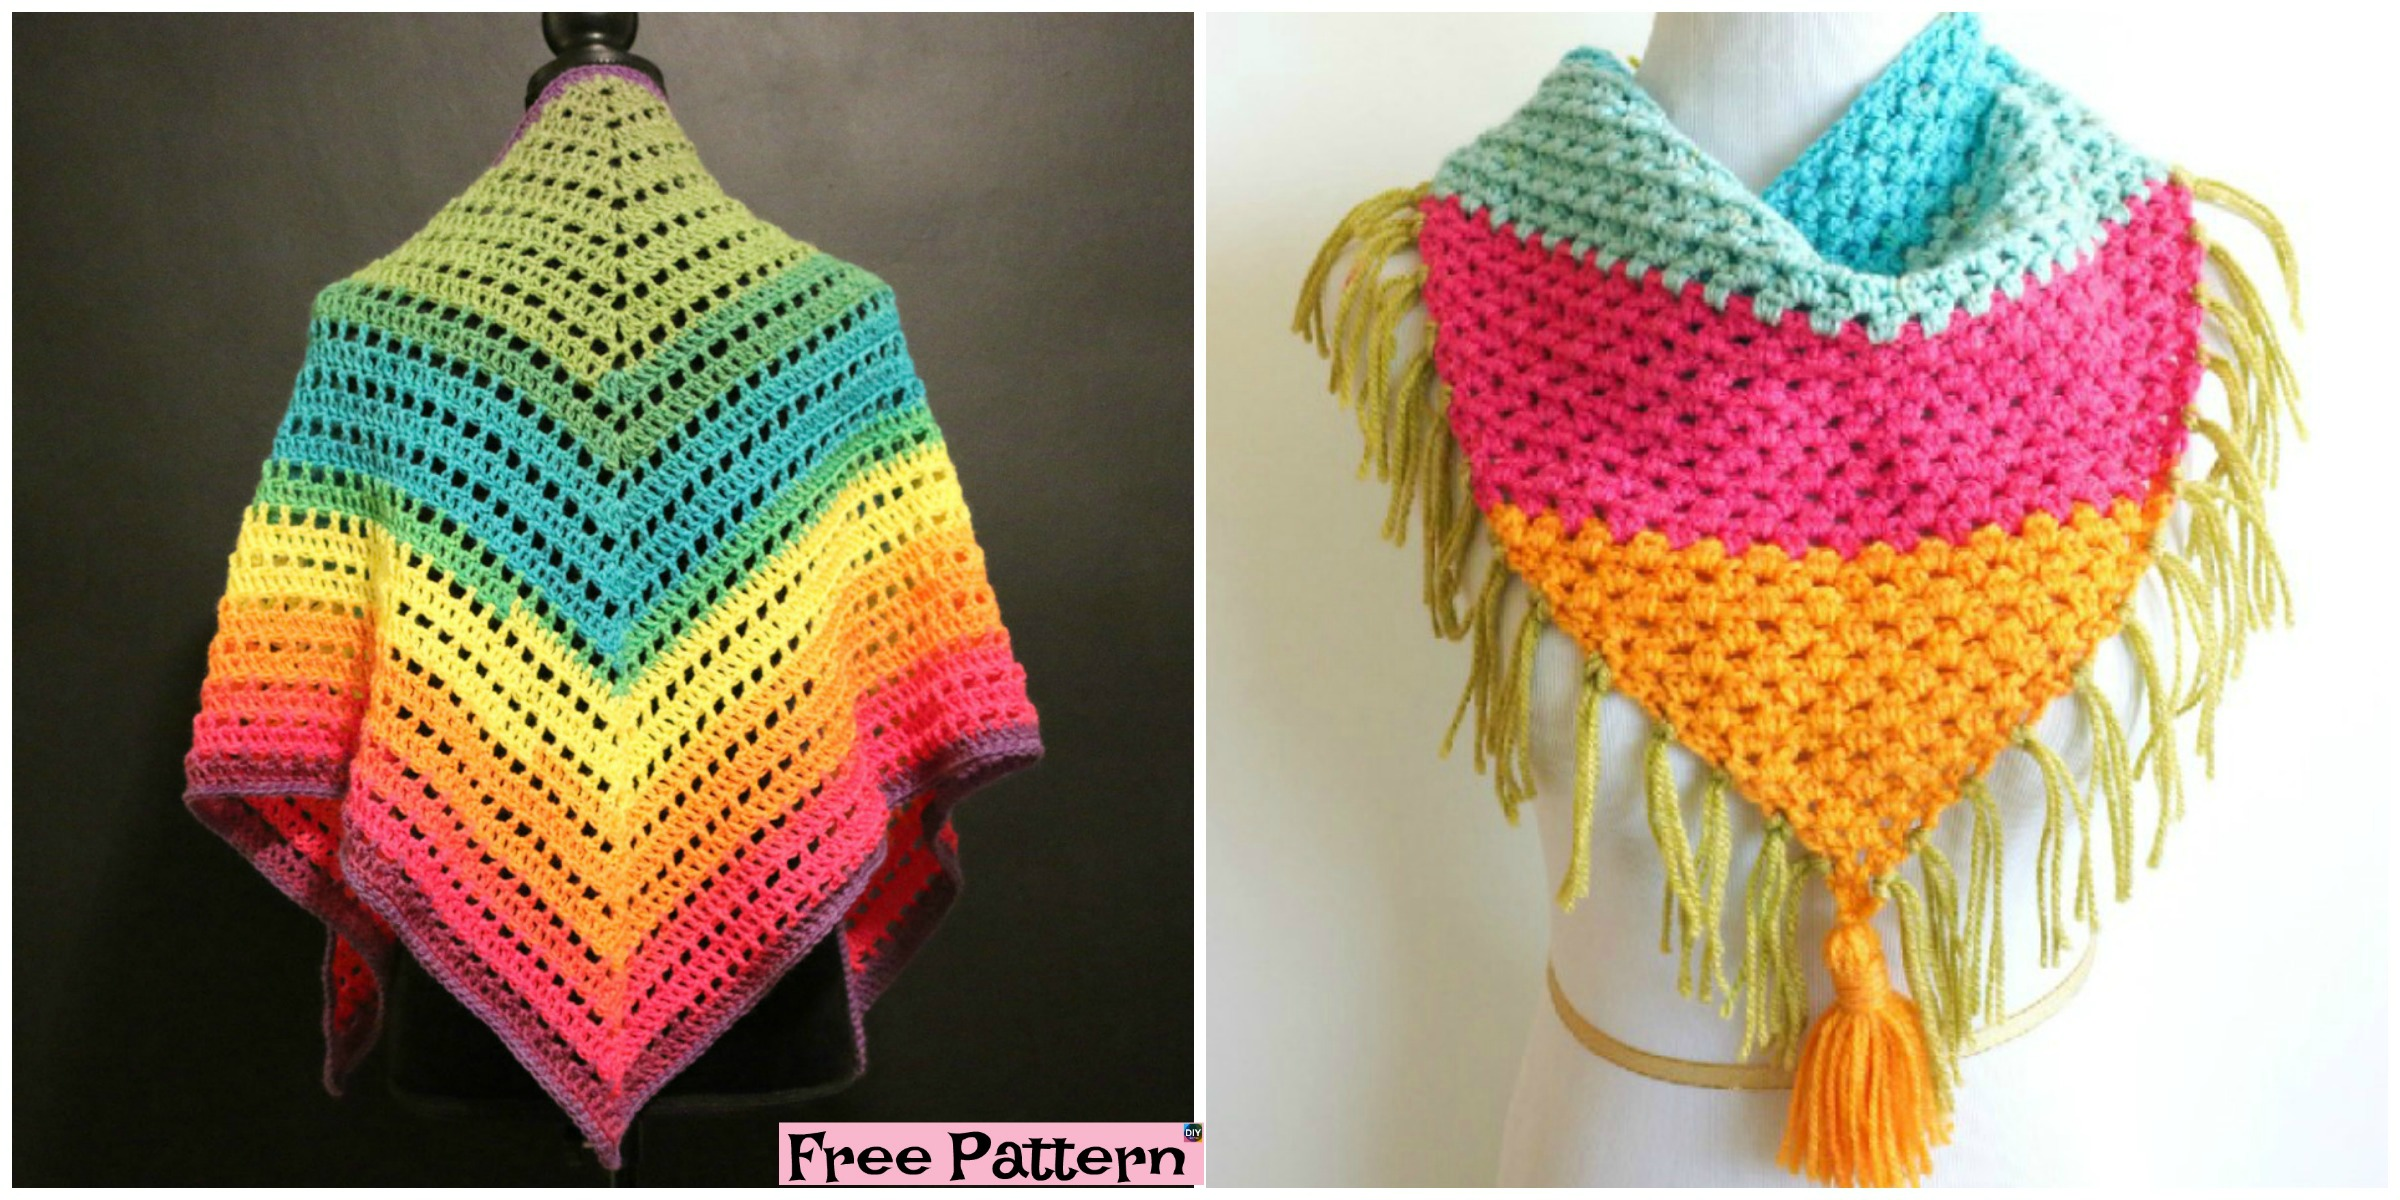 Crochet Rainbow Triangle Scarf – Free Pattern